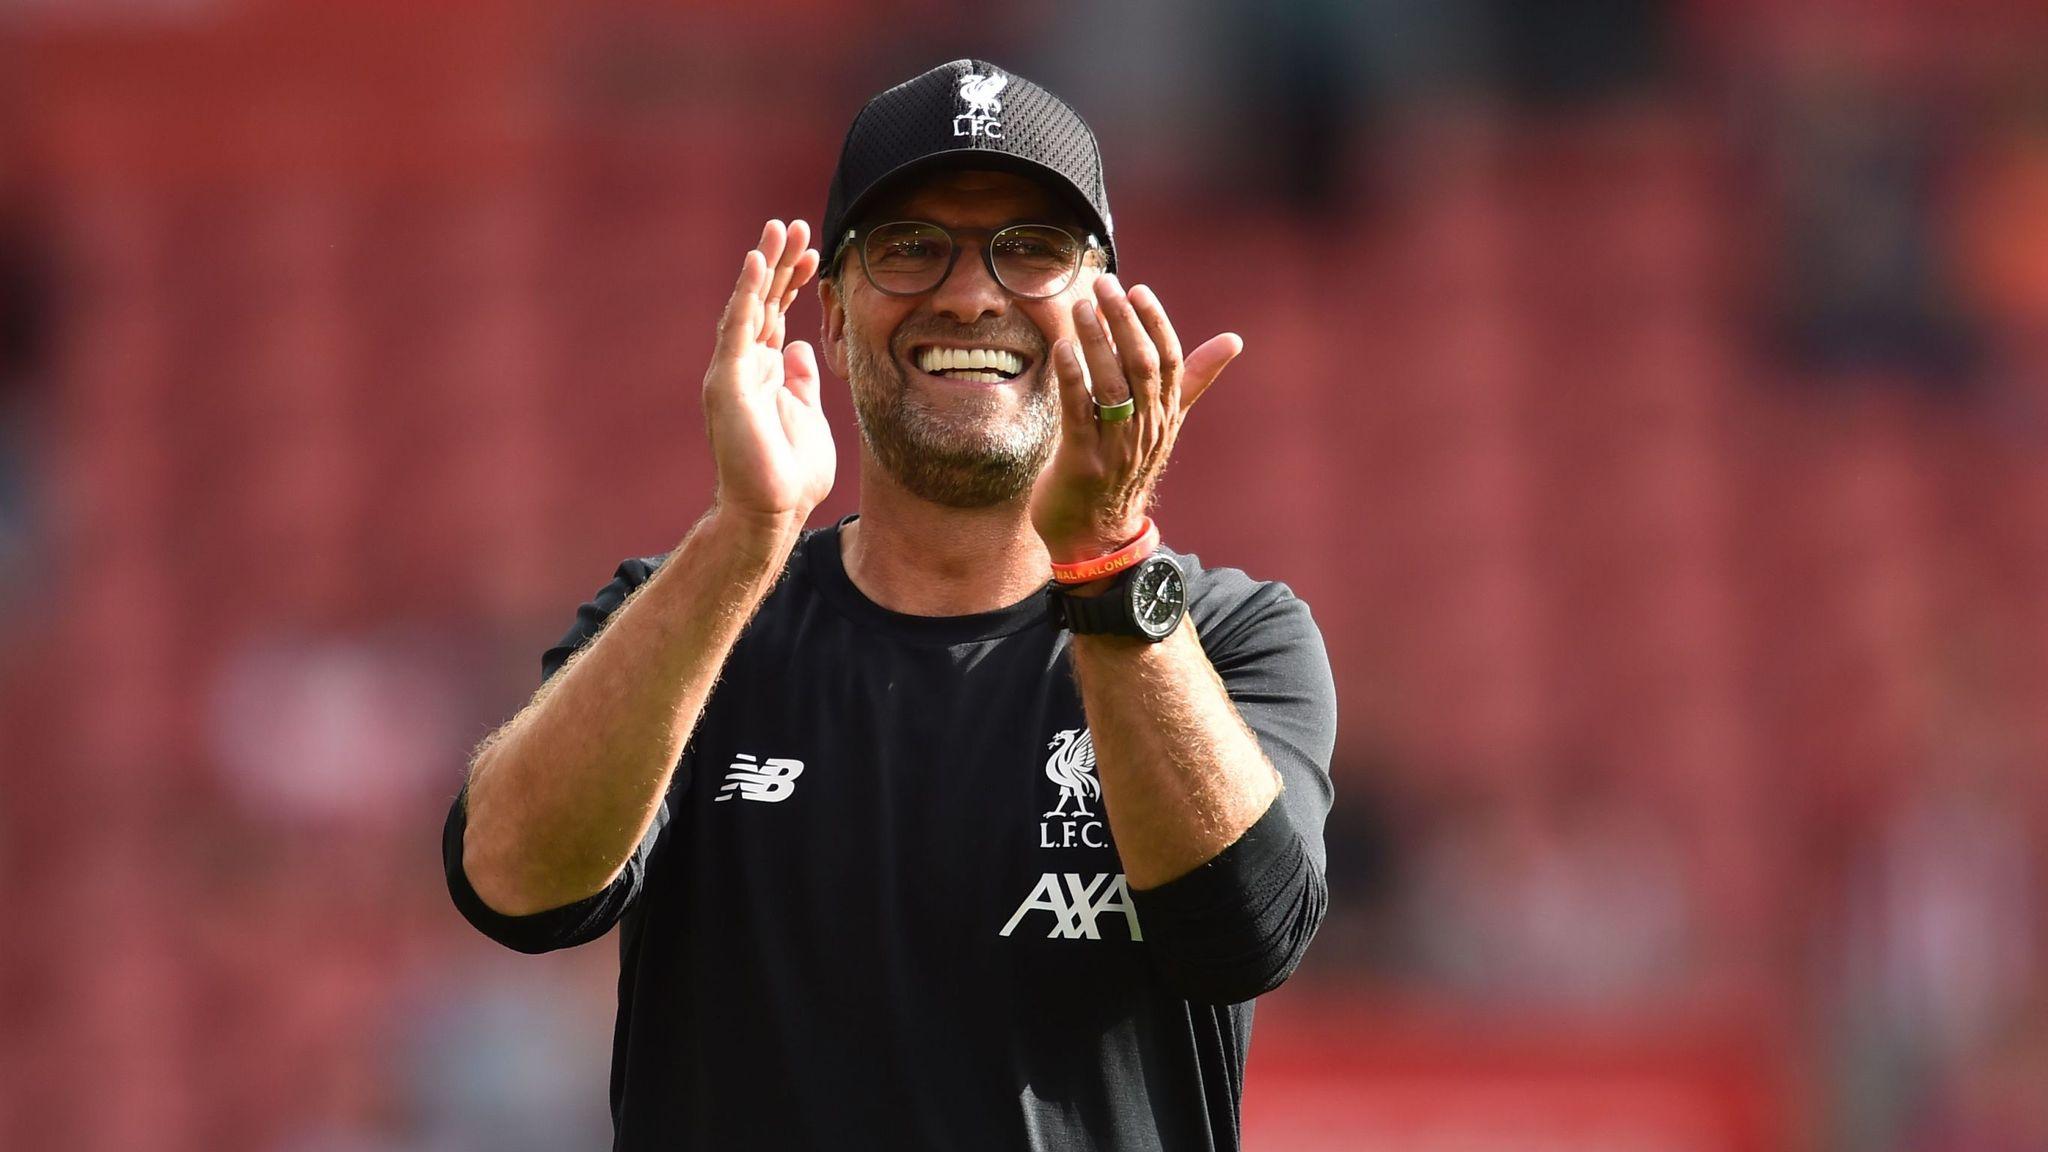 Liverpool vs Arsenal reaction: Jurgen Klopp beaming, David Luiz questions penalty decision